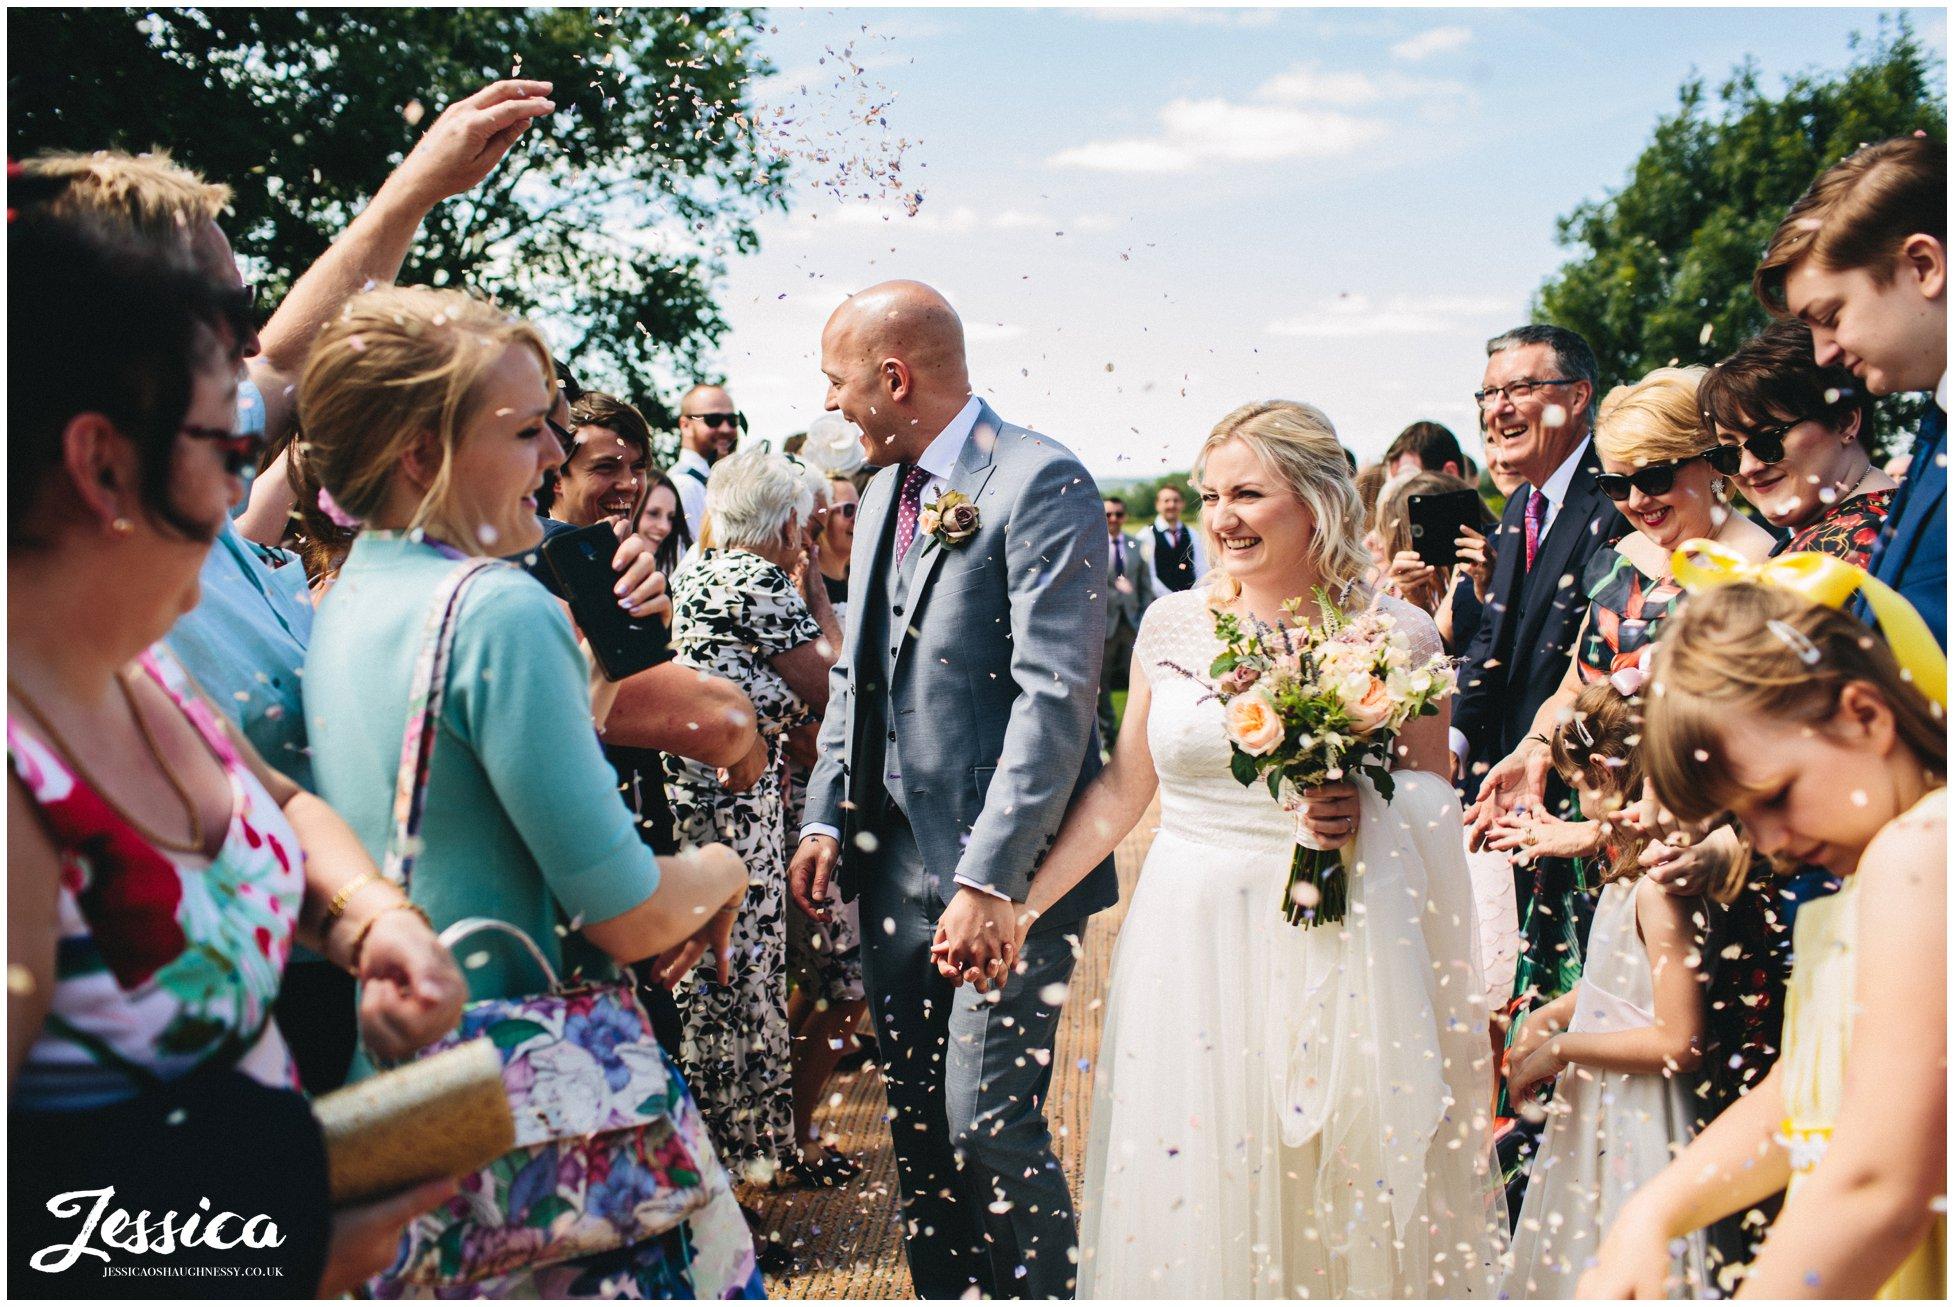 bride & groom walk through the confetti line